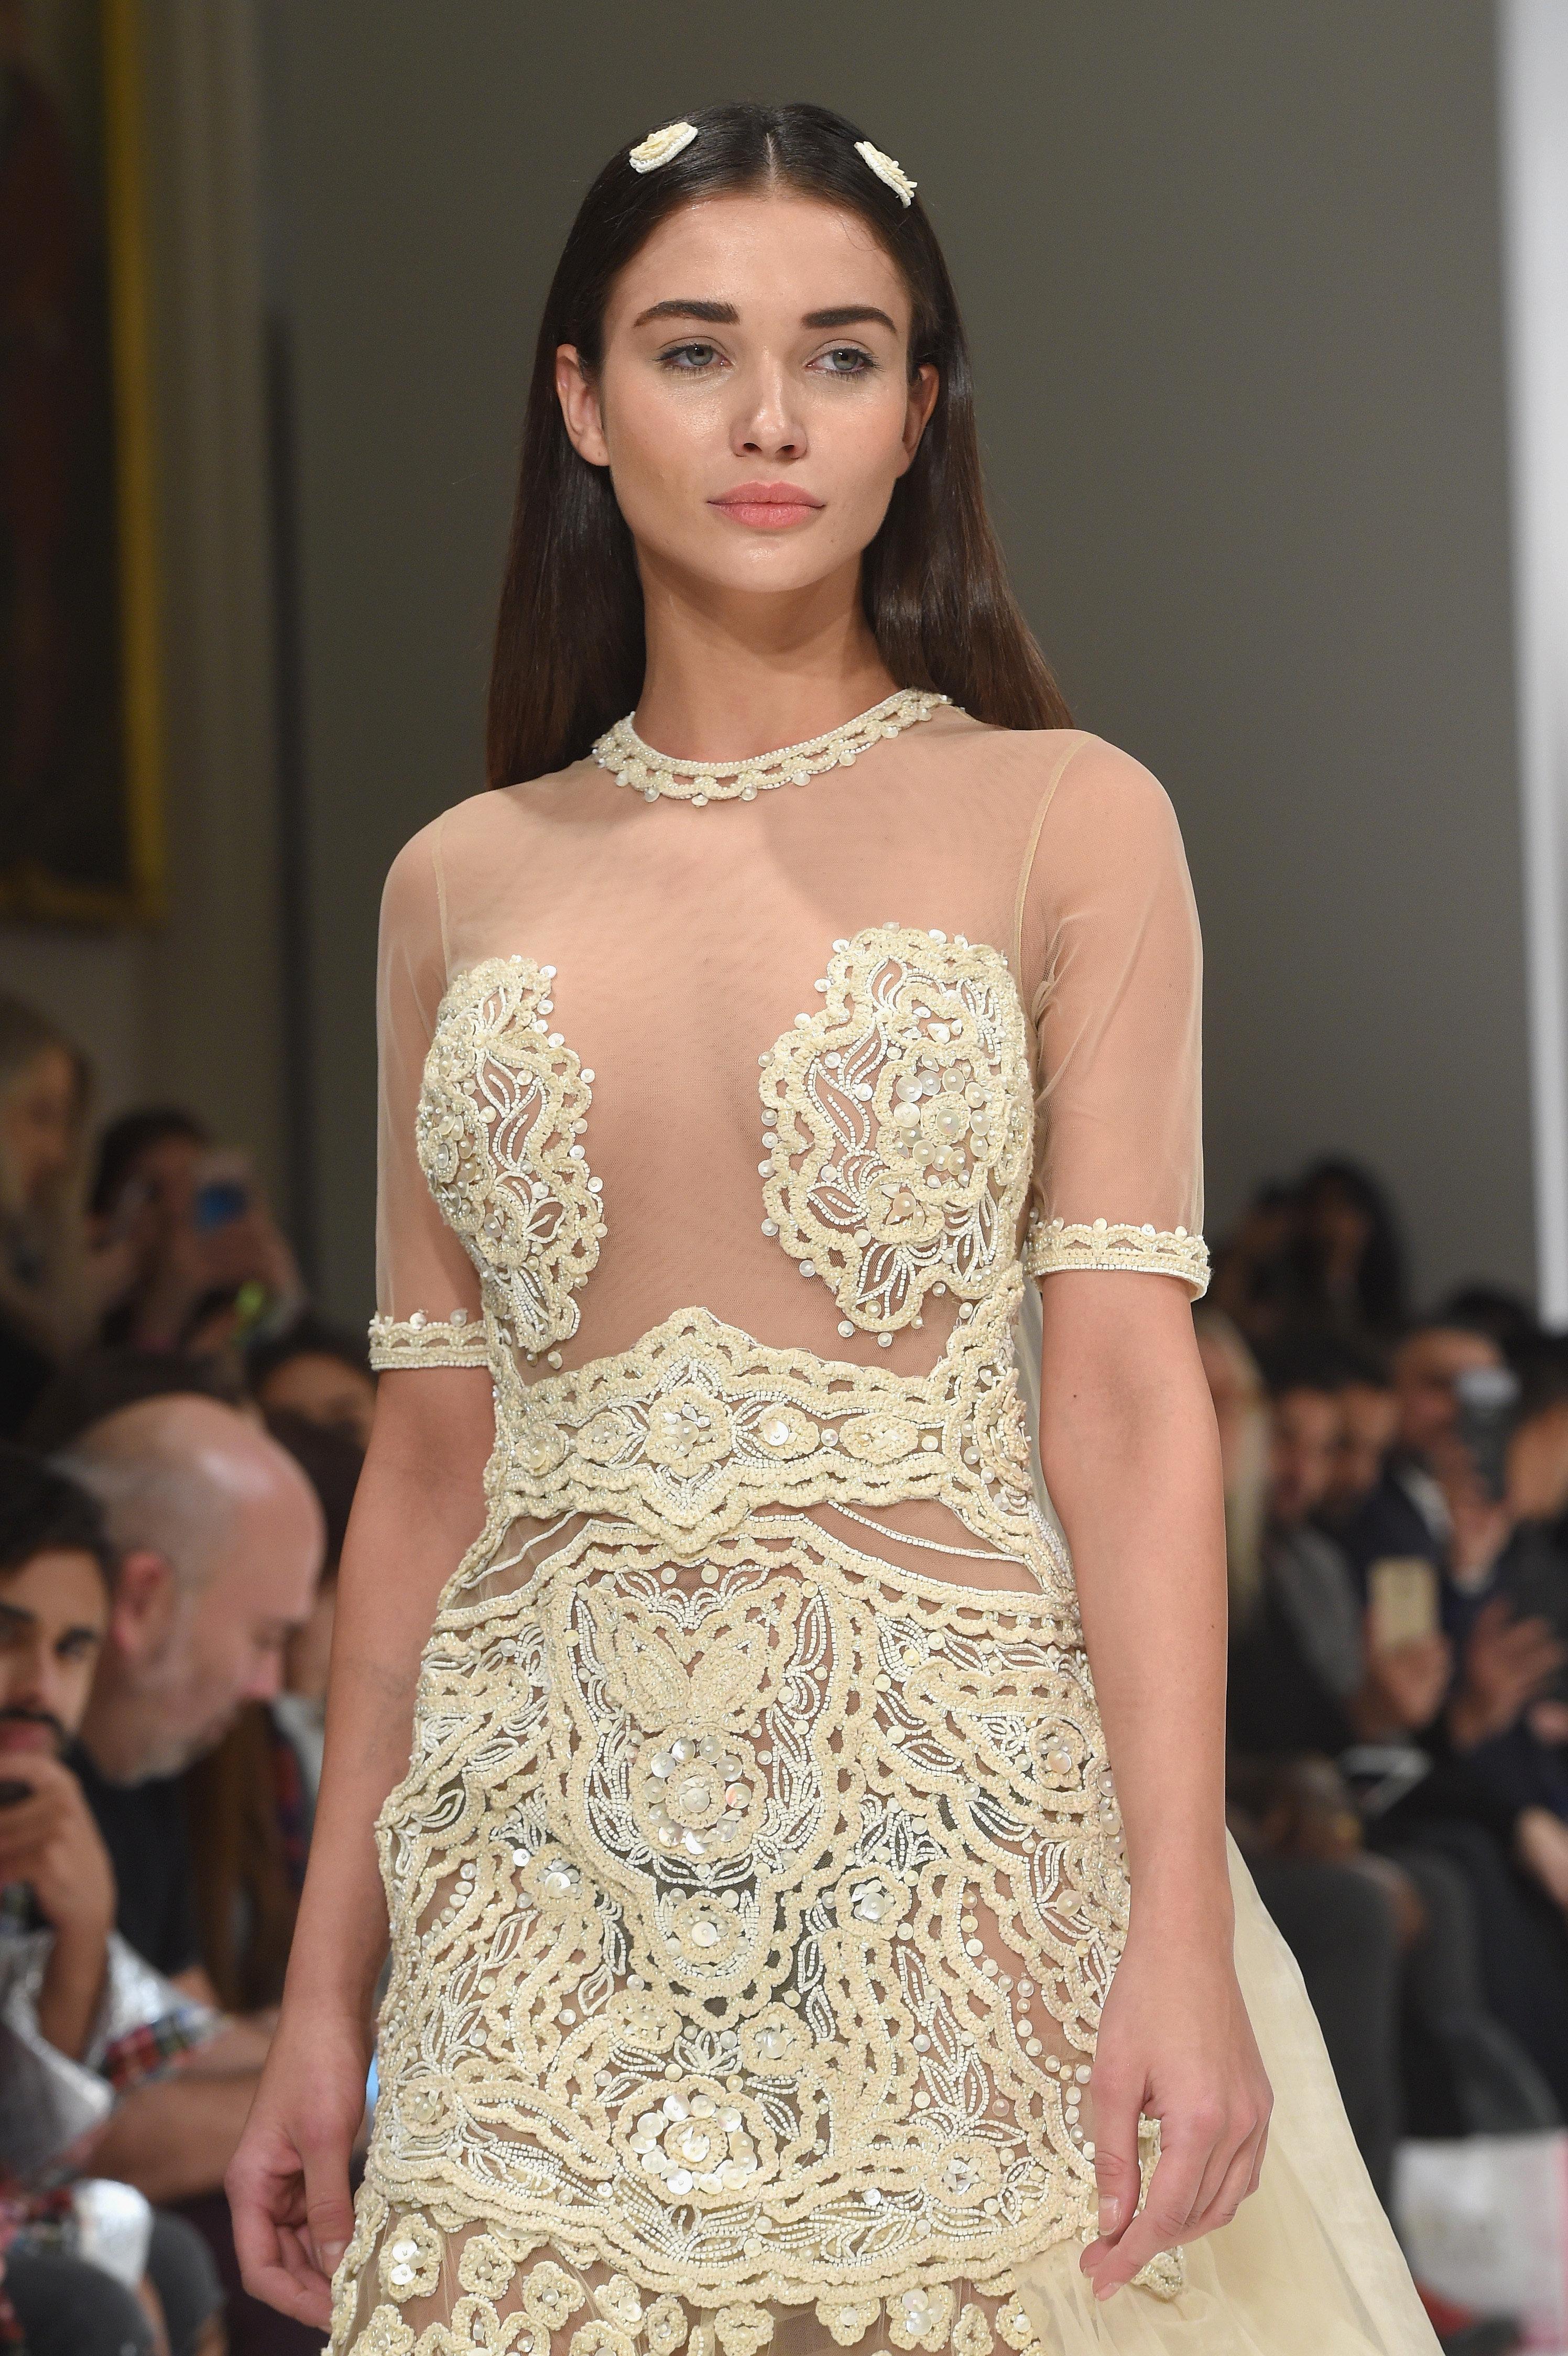 London Fashion Week 2017: Rocky Star's Nearly-Naked Wedding Dress Wins Fans On